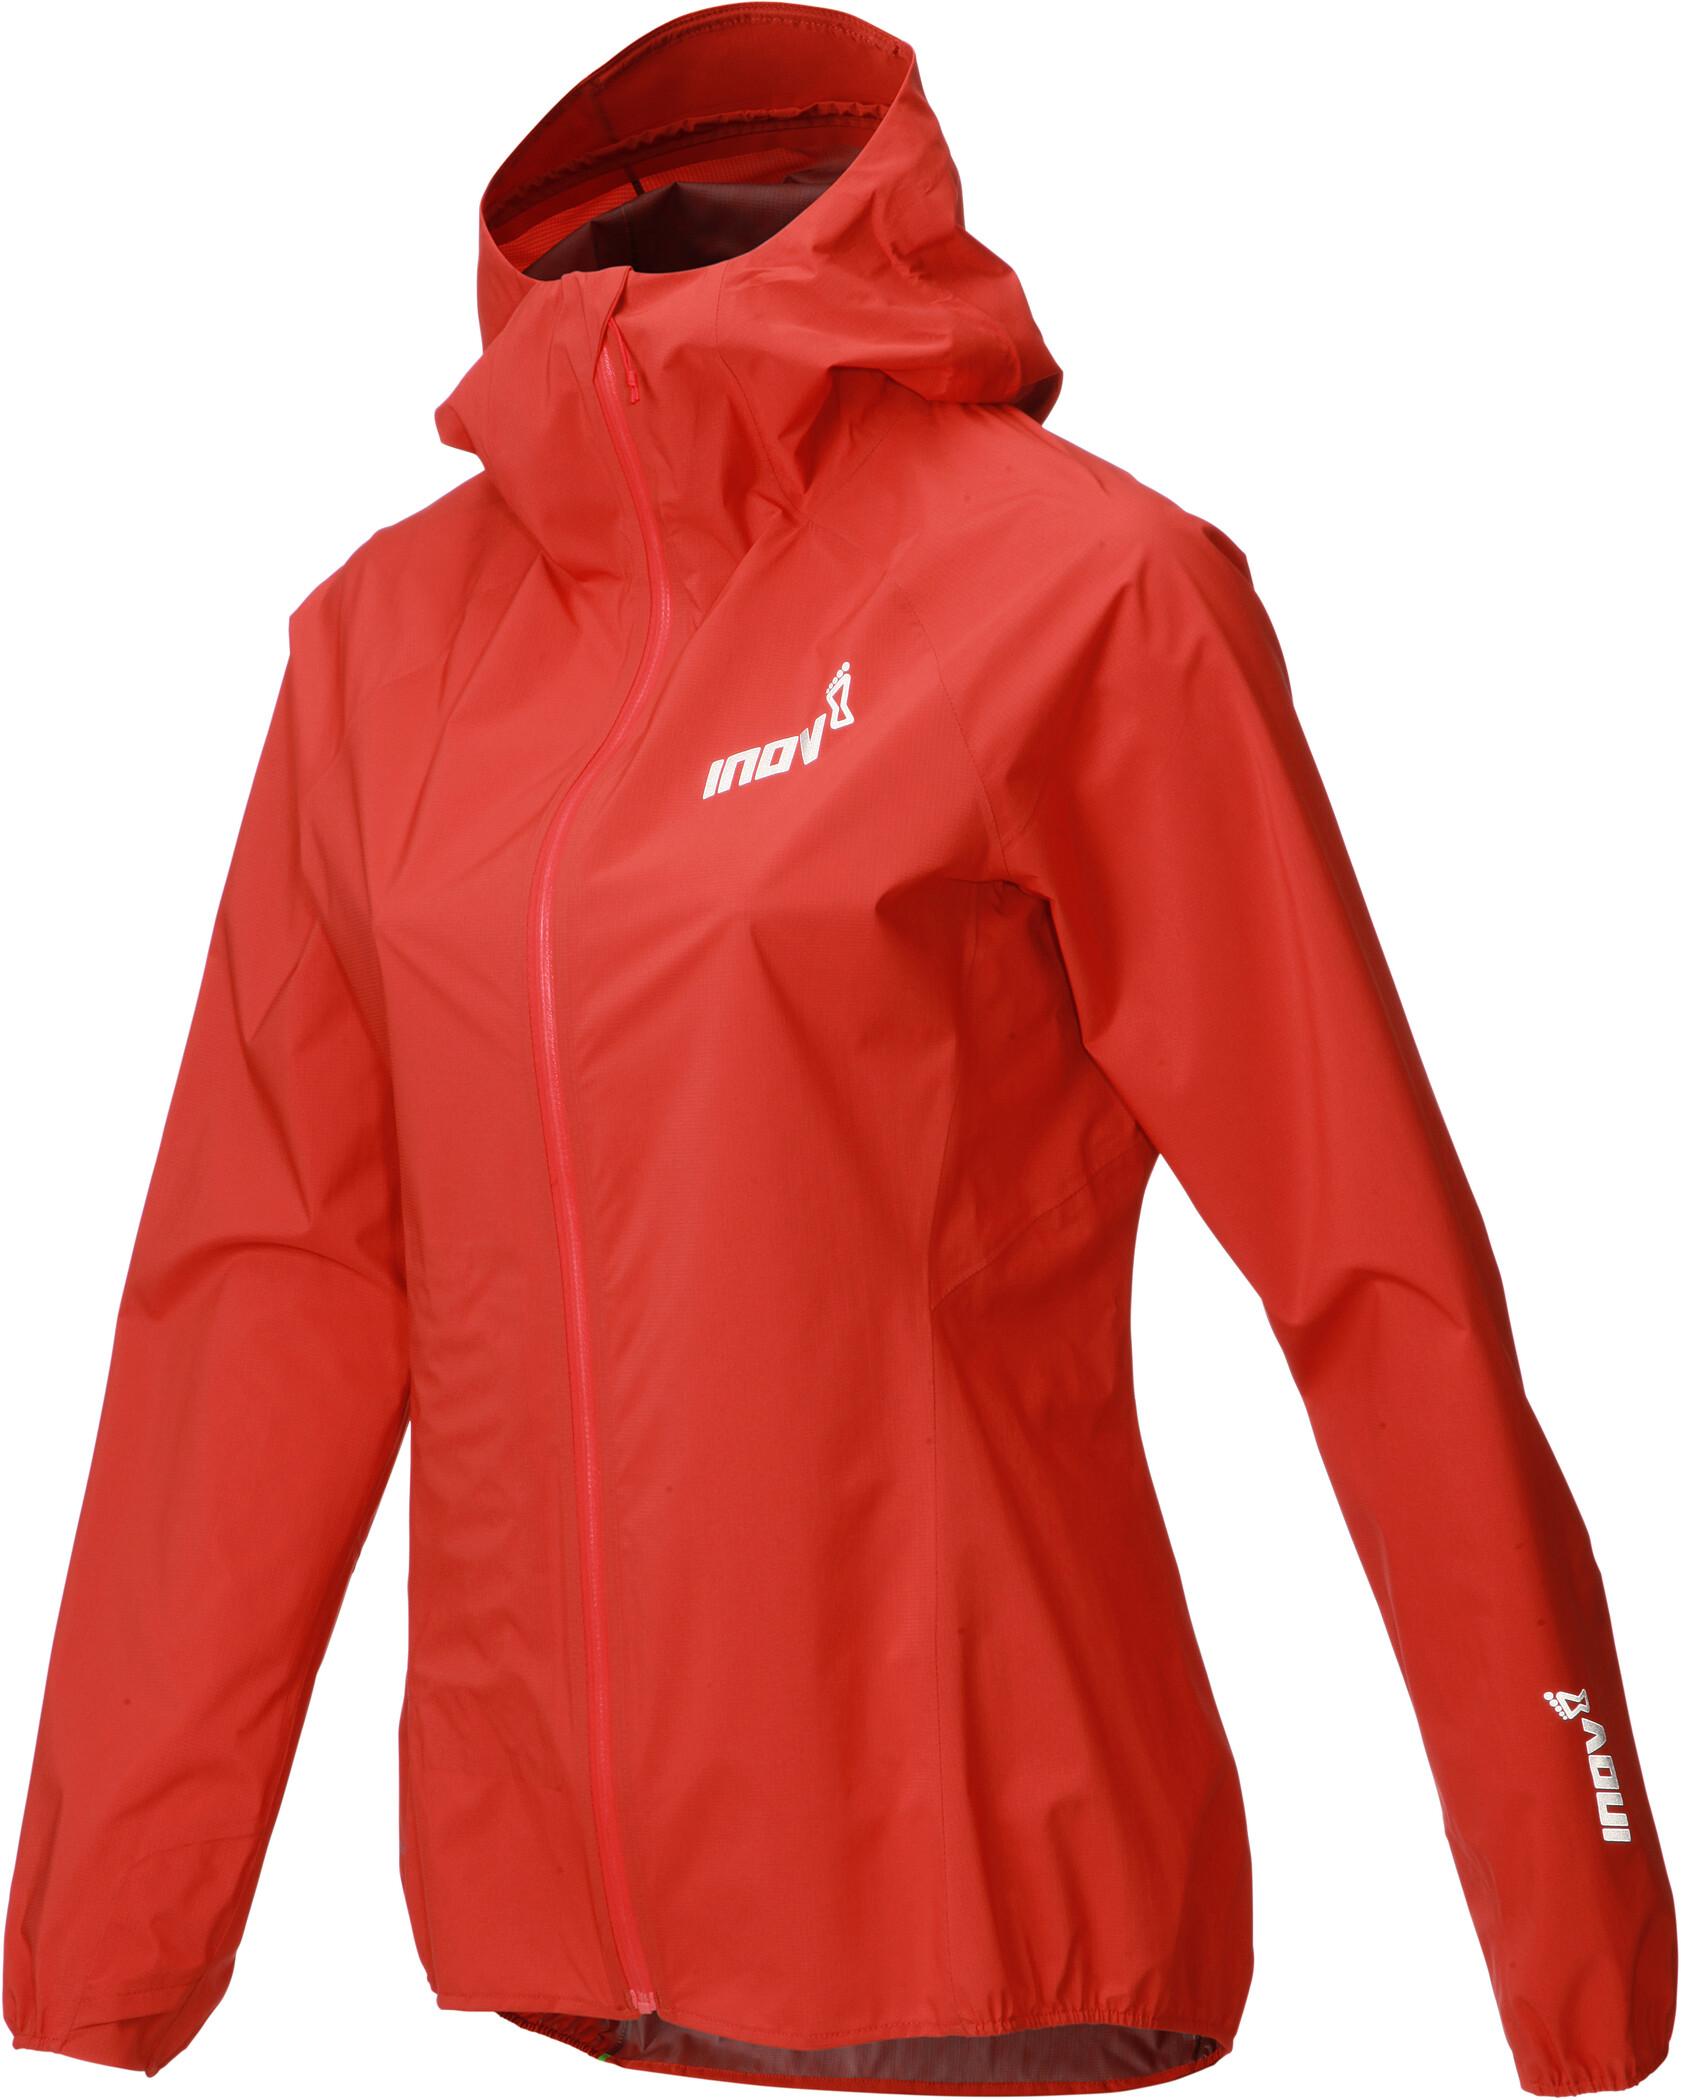 inov-8 Stormshell FZ Damer, red (2019)   Jackets